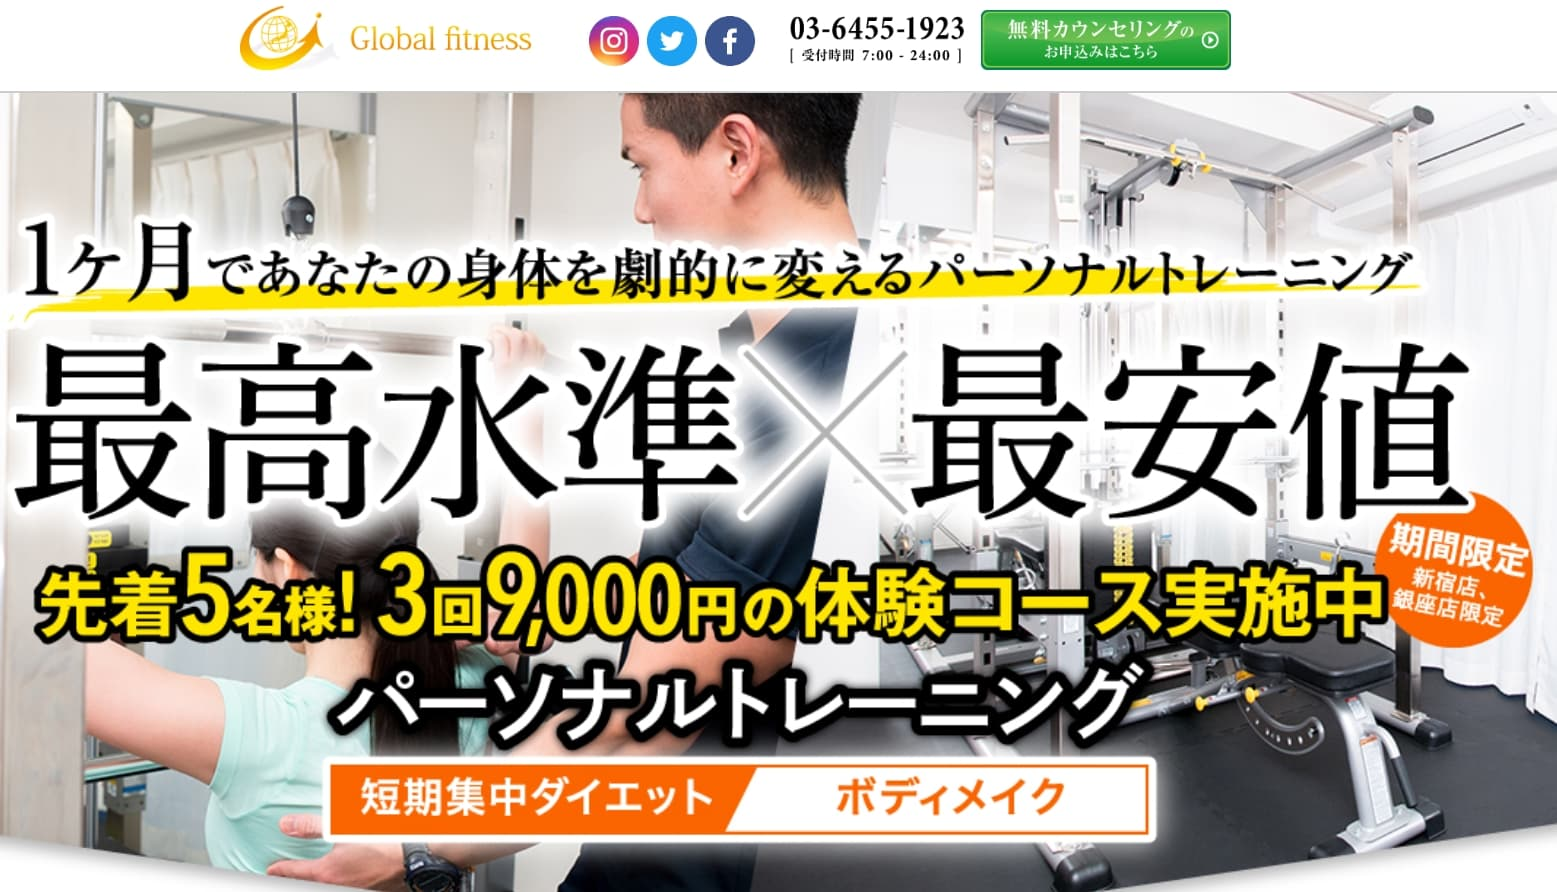 Global fitness  横浜駅周辺のパーソナルトレーニングジム